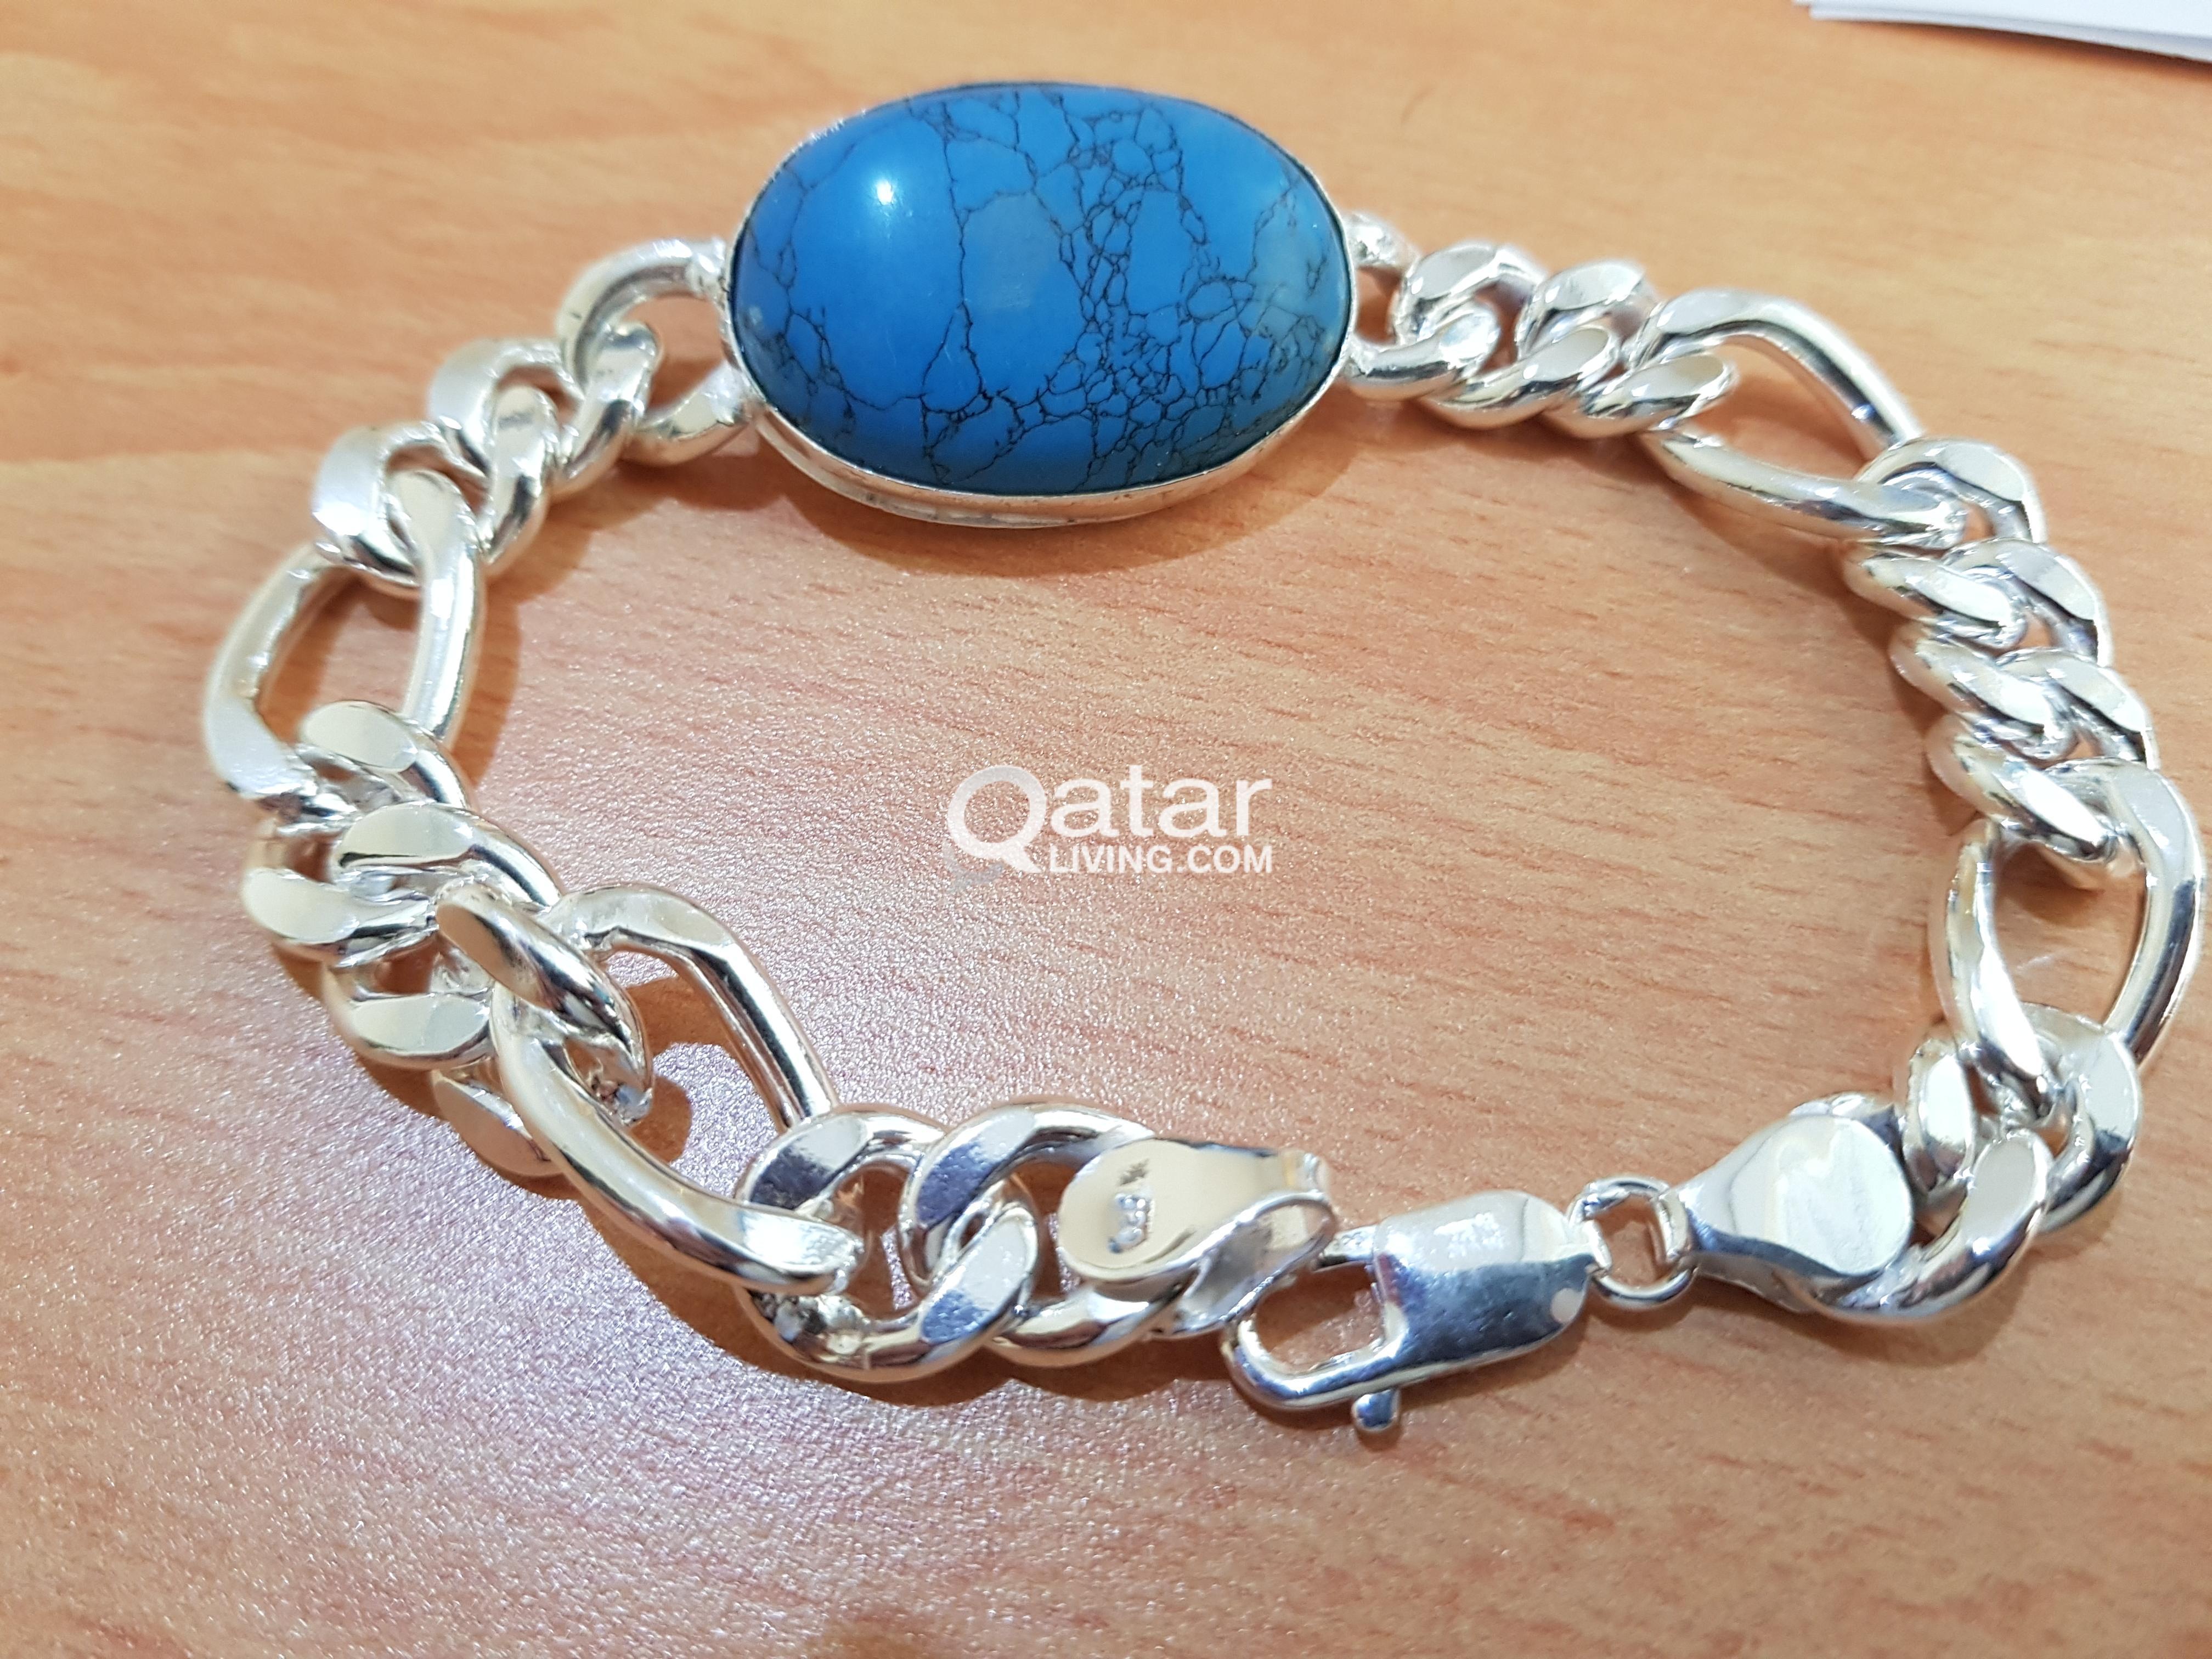 Hand Bracelet for men 47 grams silver pure 925